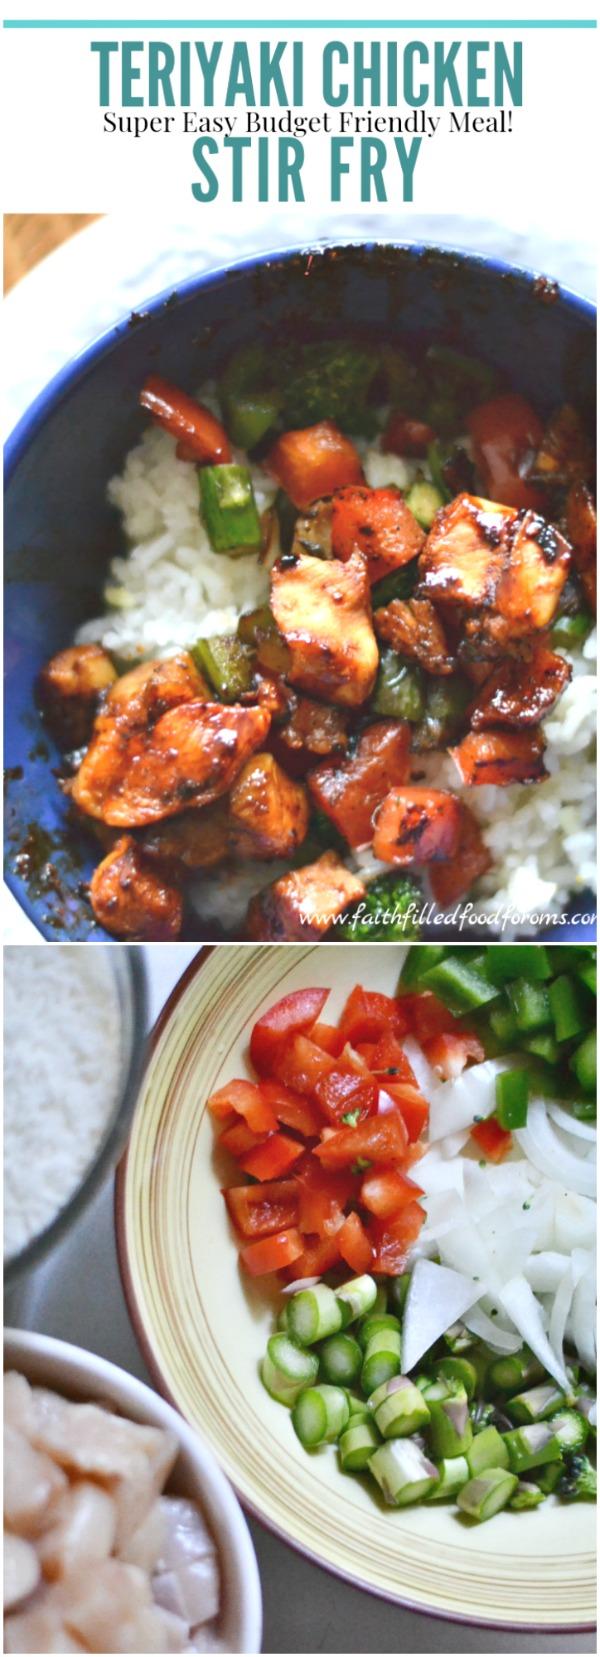 Teriyaki Chicken Stir Fry Super easy budget friendly meal!